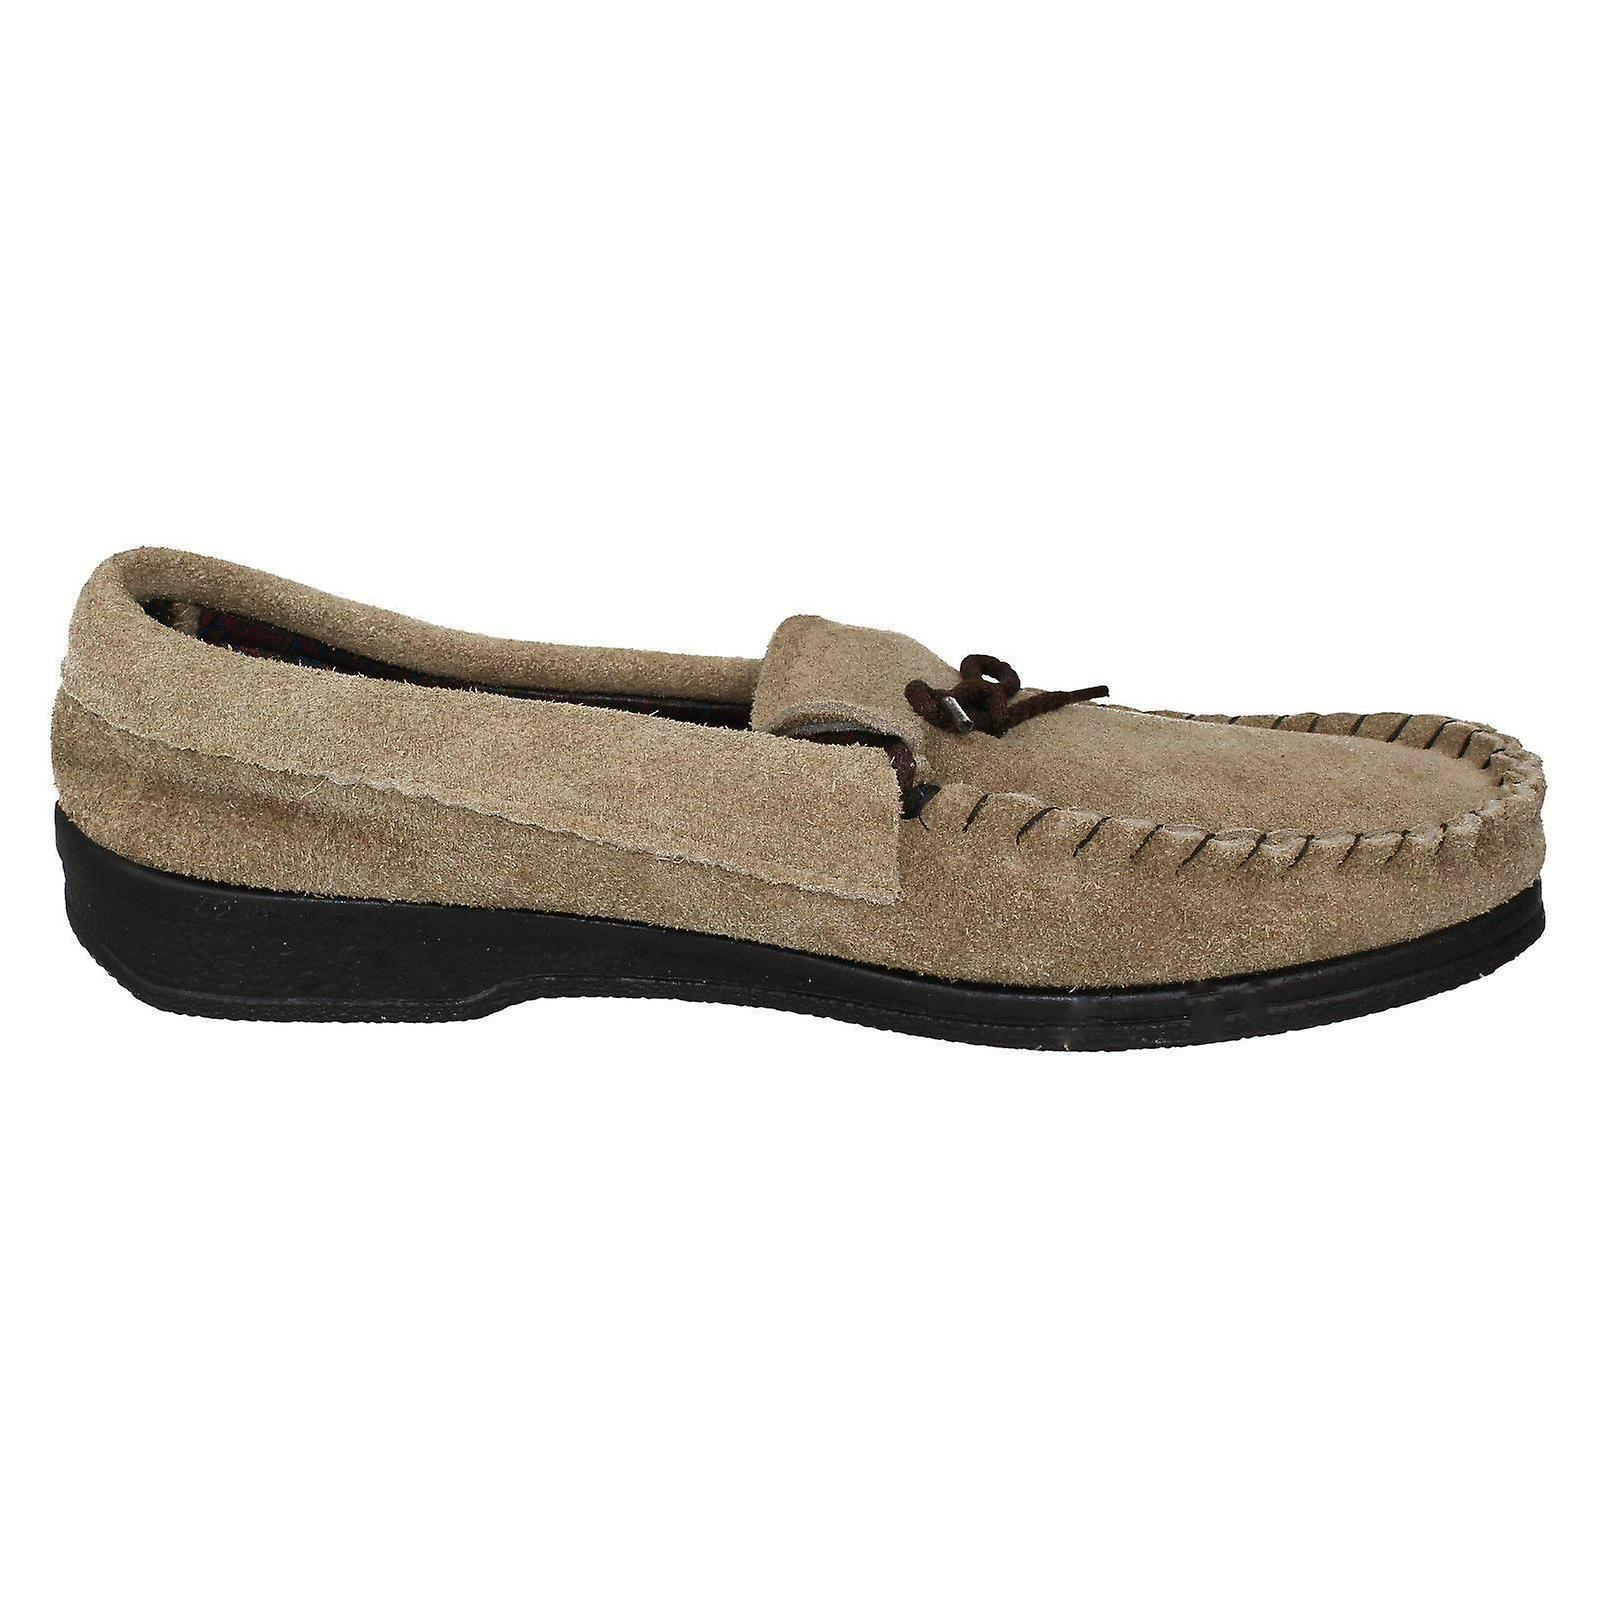 Mens Spot sur Moccasin Slippers